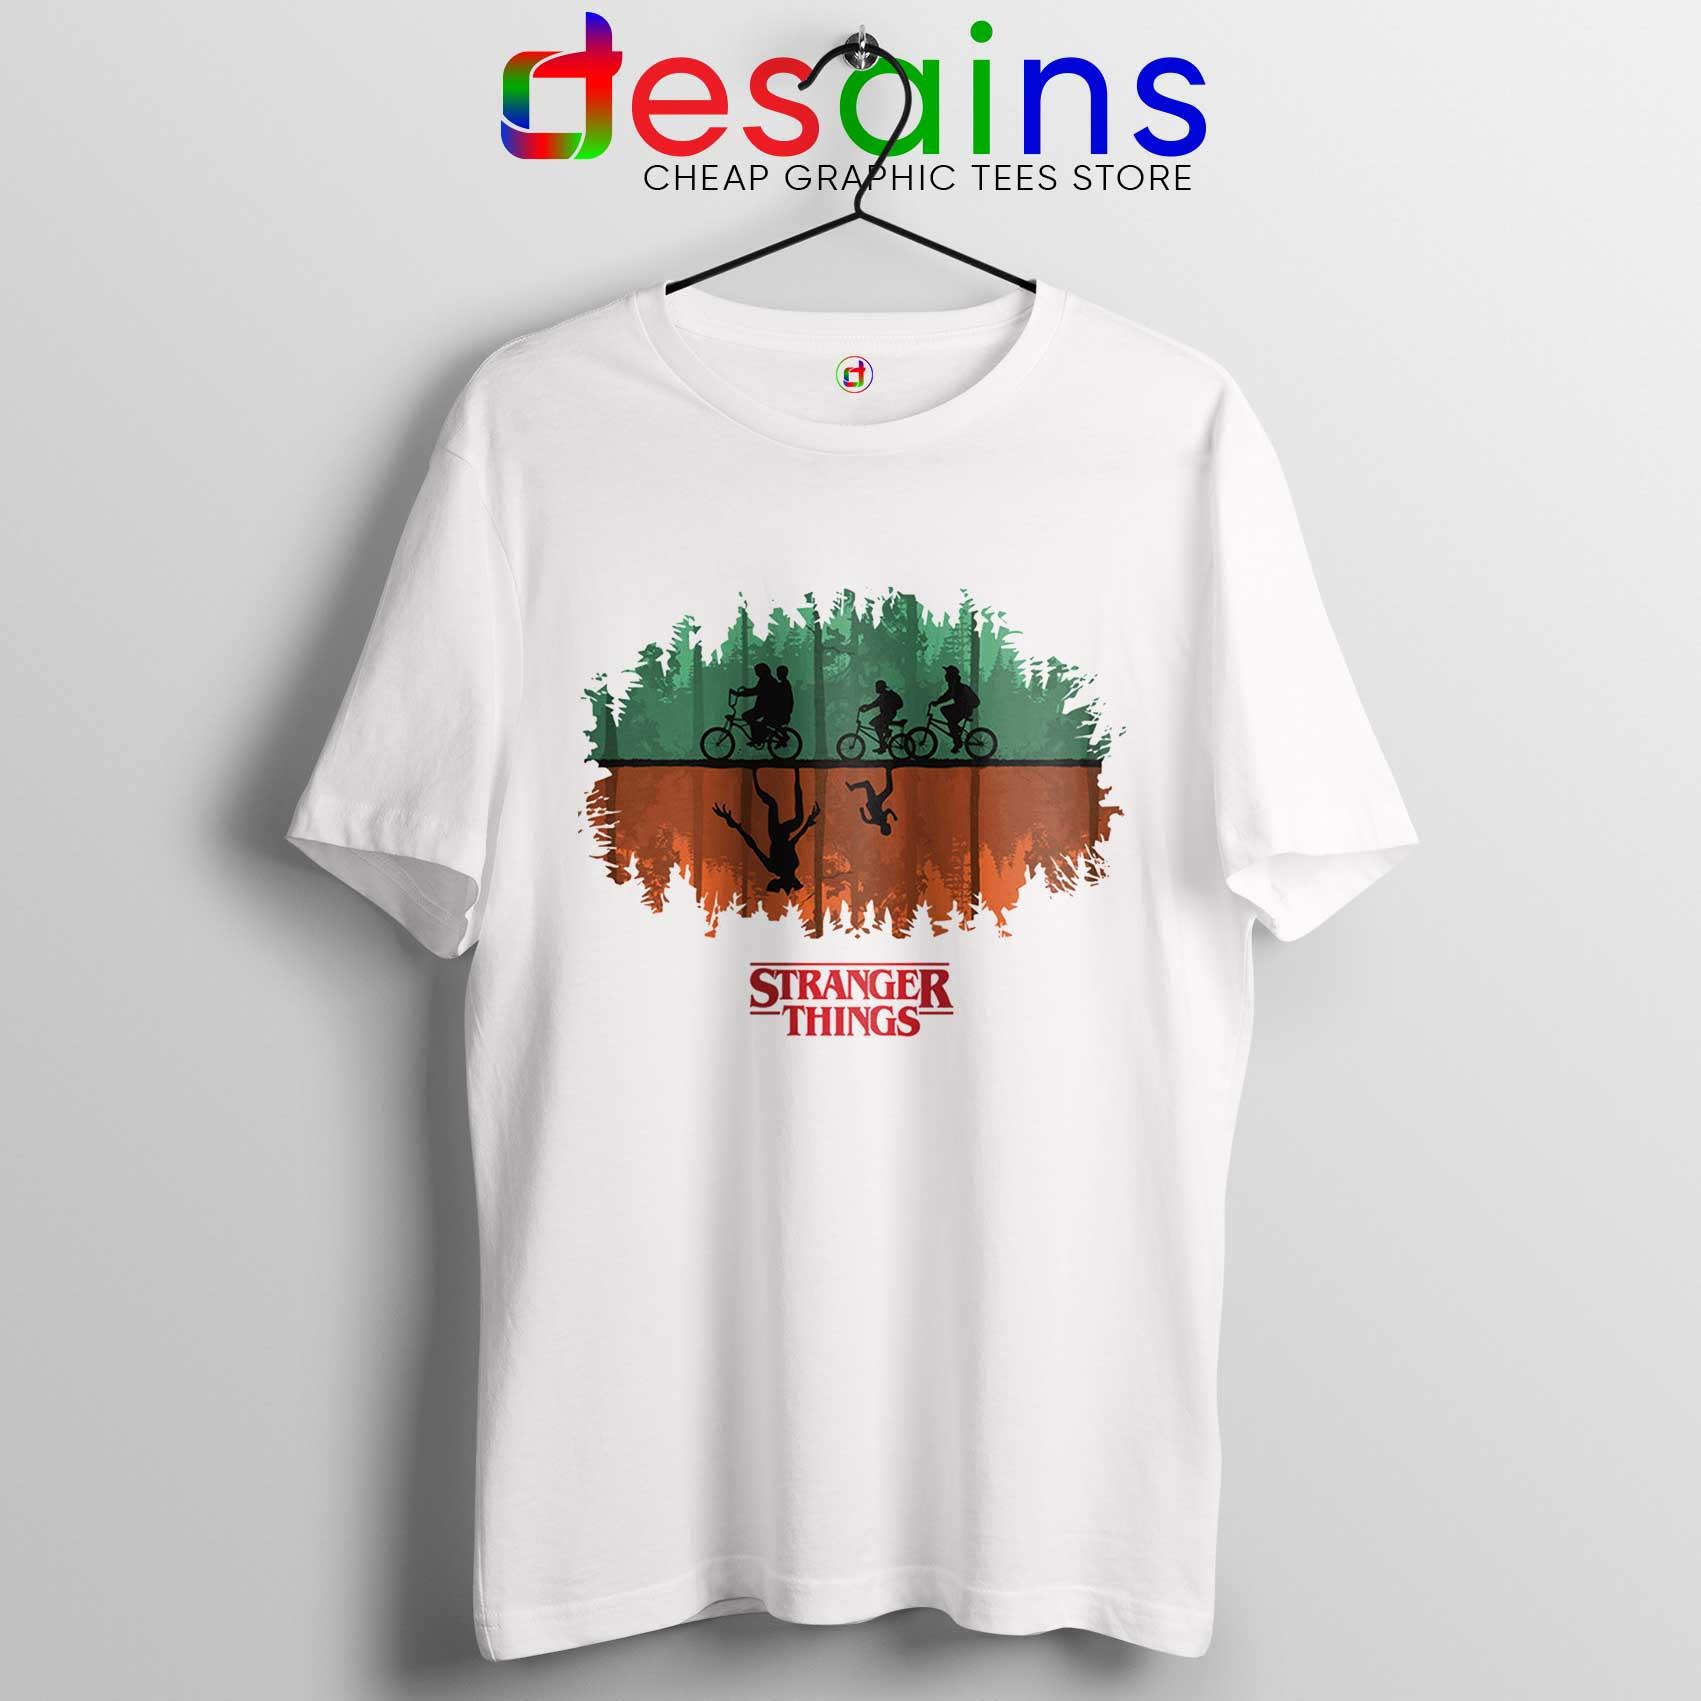 c68126591 Tee-Shirt-Stranger-Things-Season-3-Poster-Cheap-T-shirt-Size-S-3XL.jpg